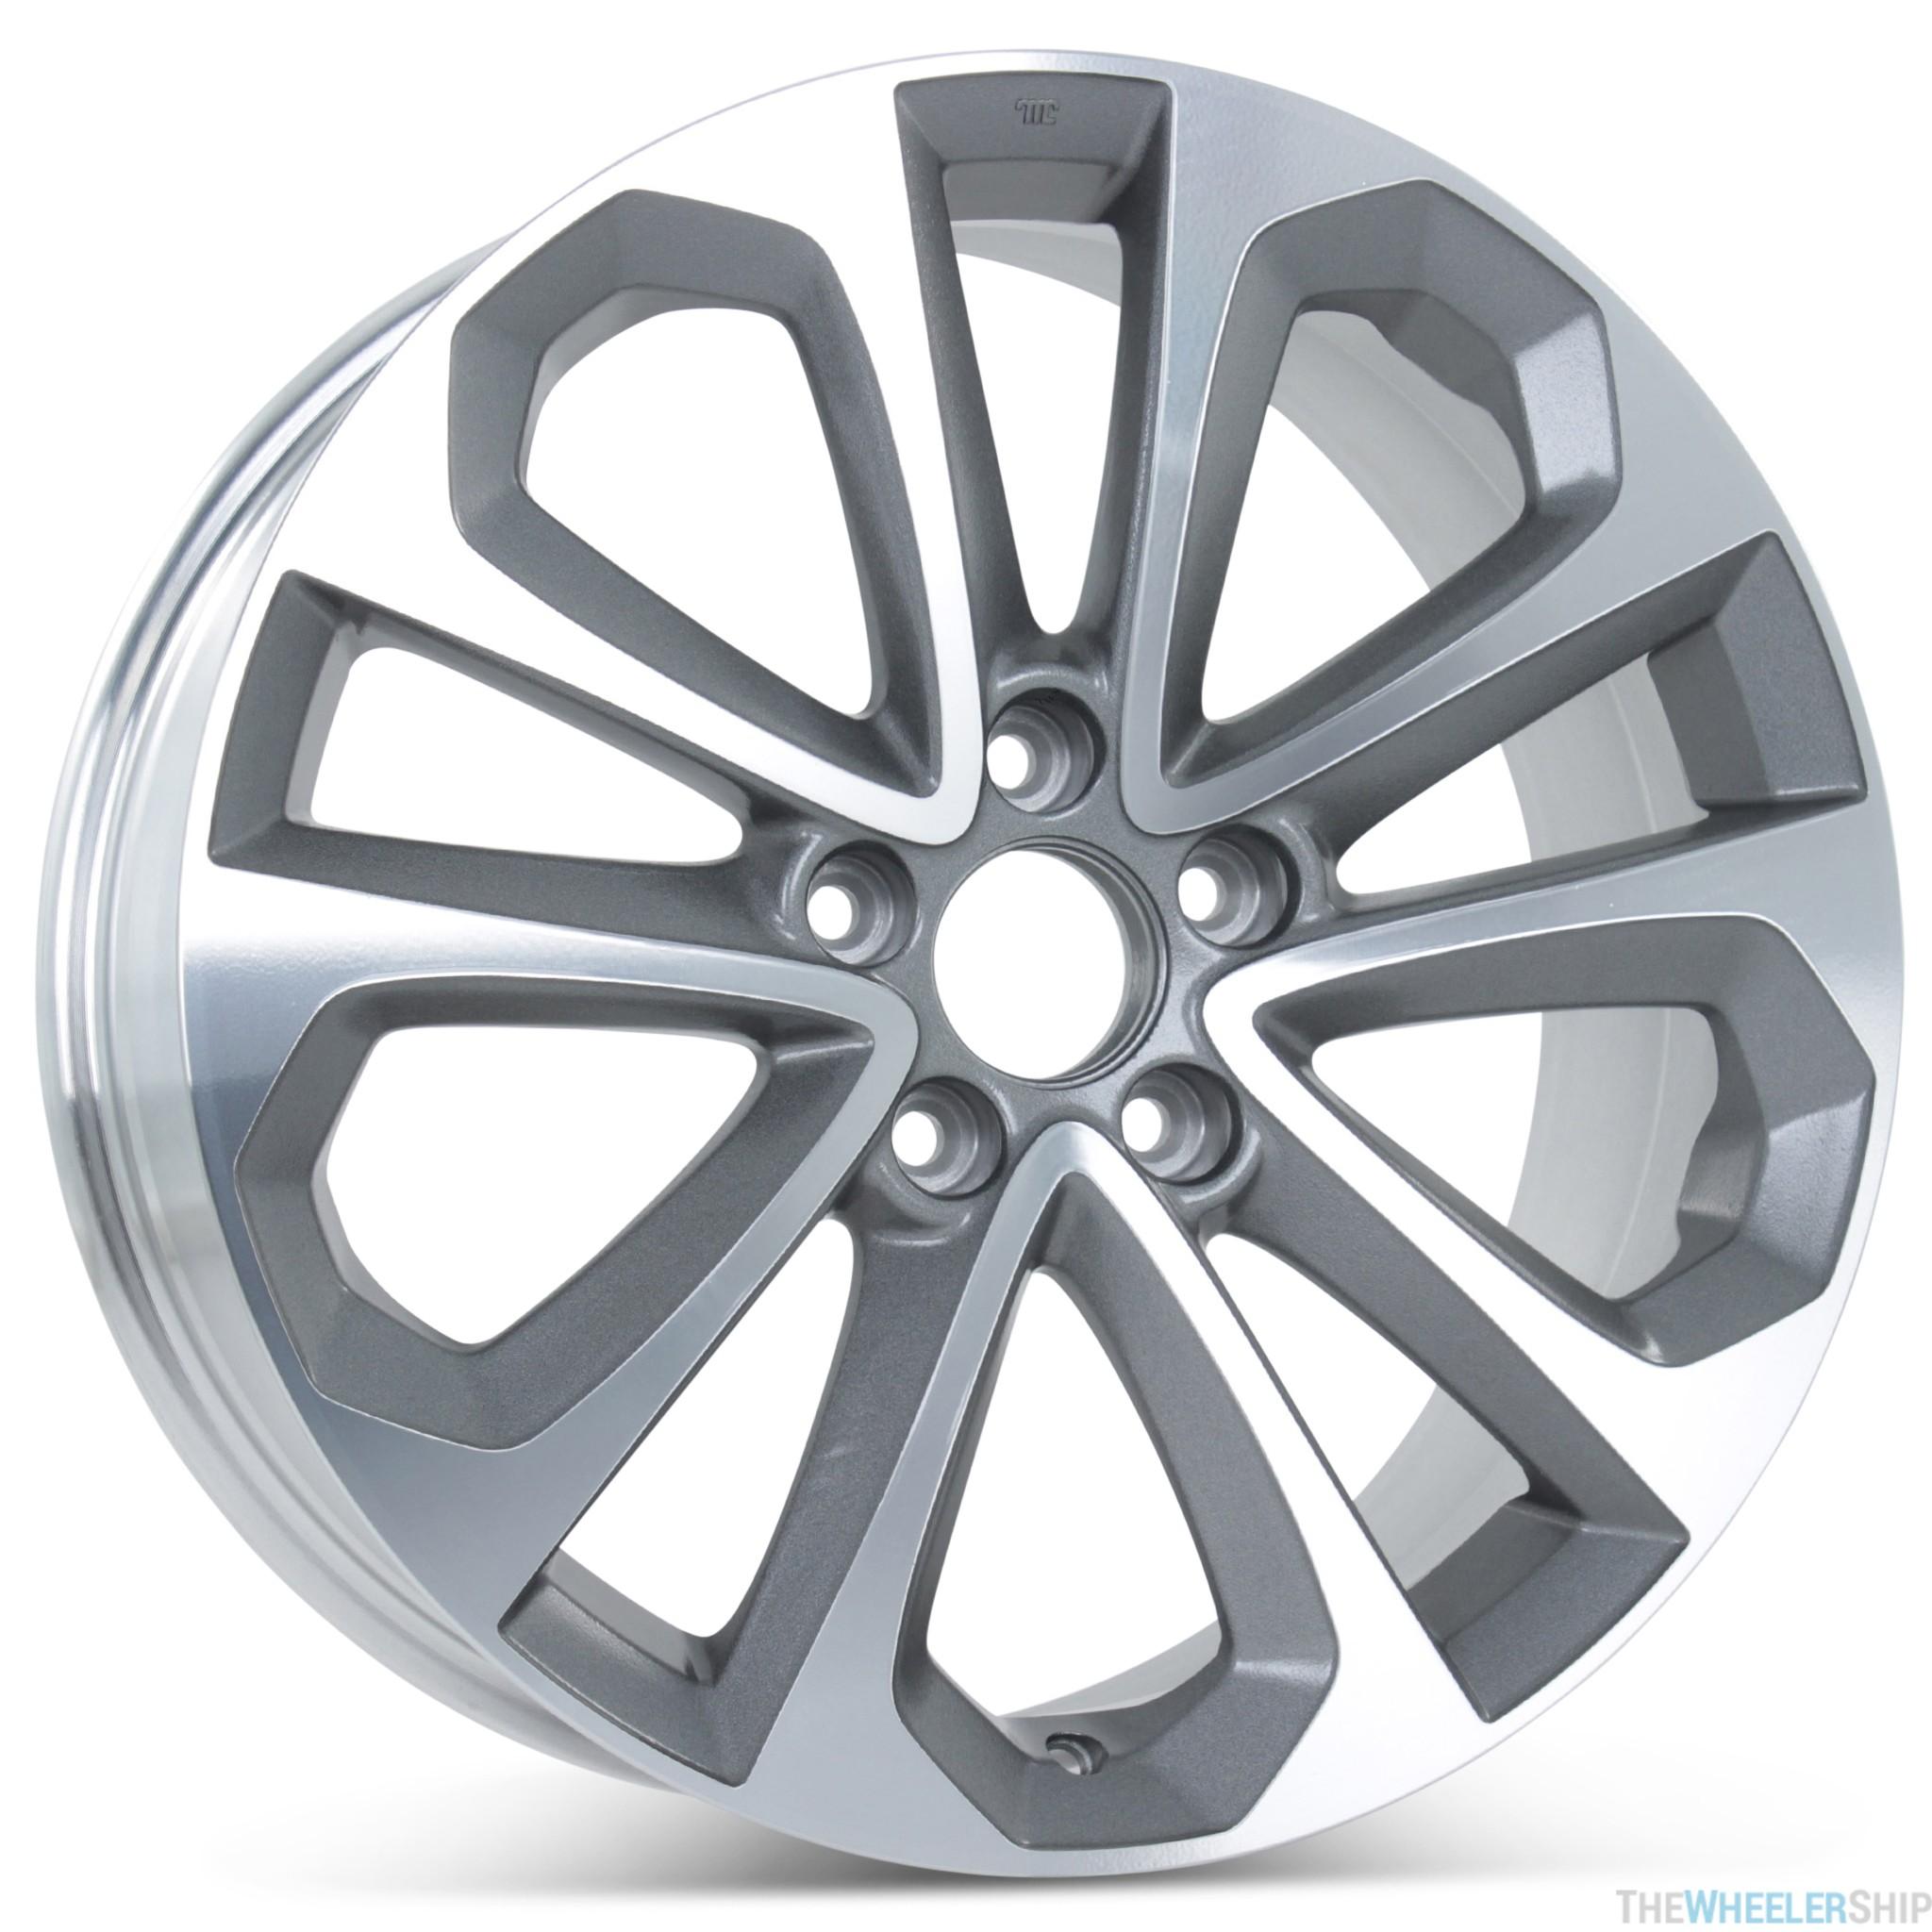 makfahrglossblack product gloss volvo fahr alloy rims route black wheels